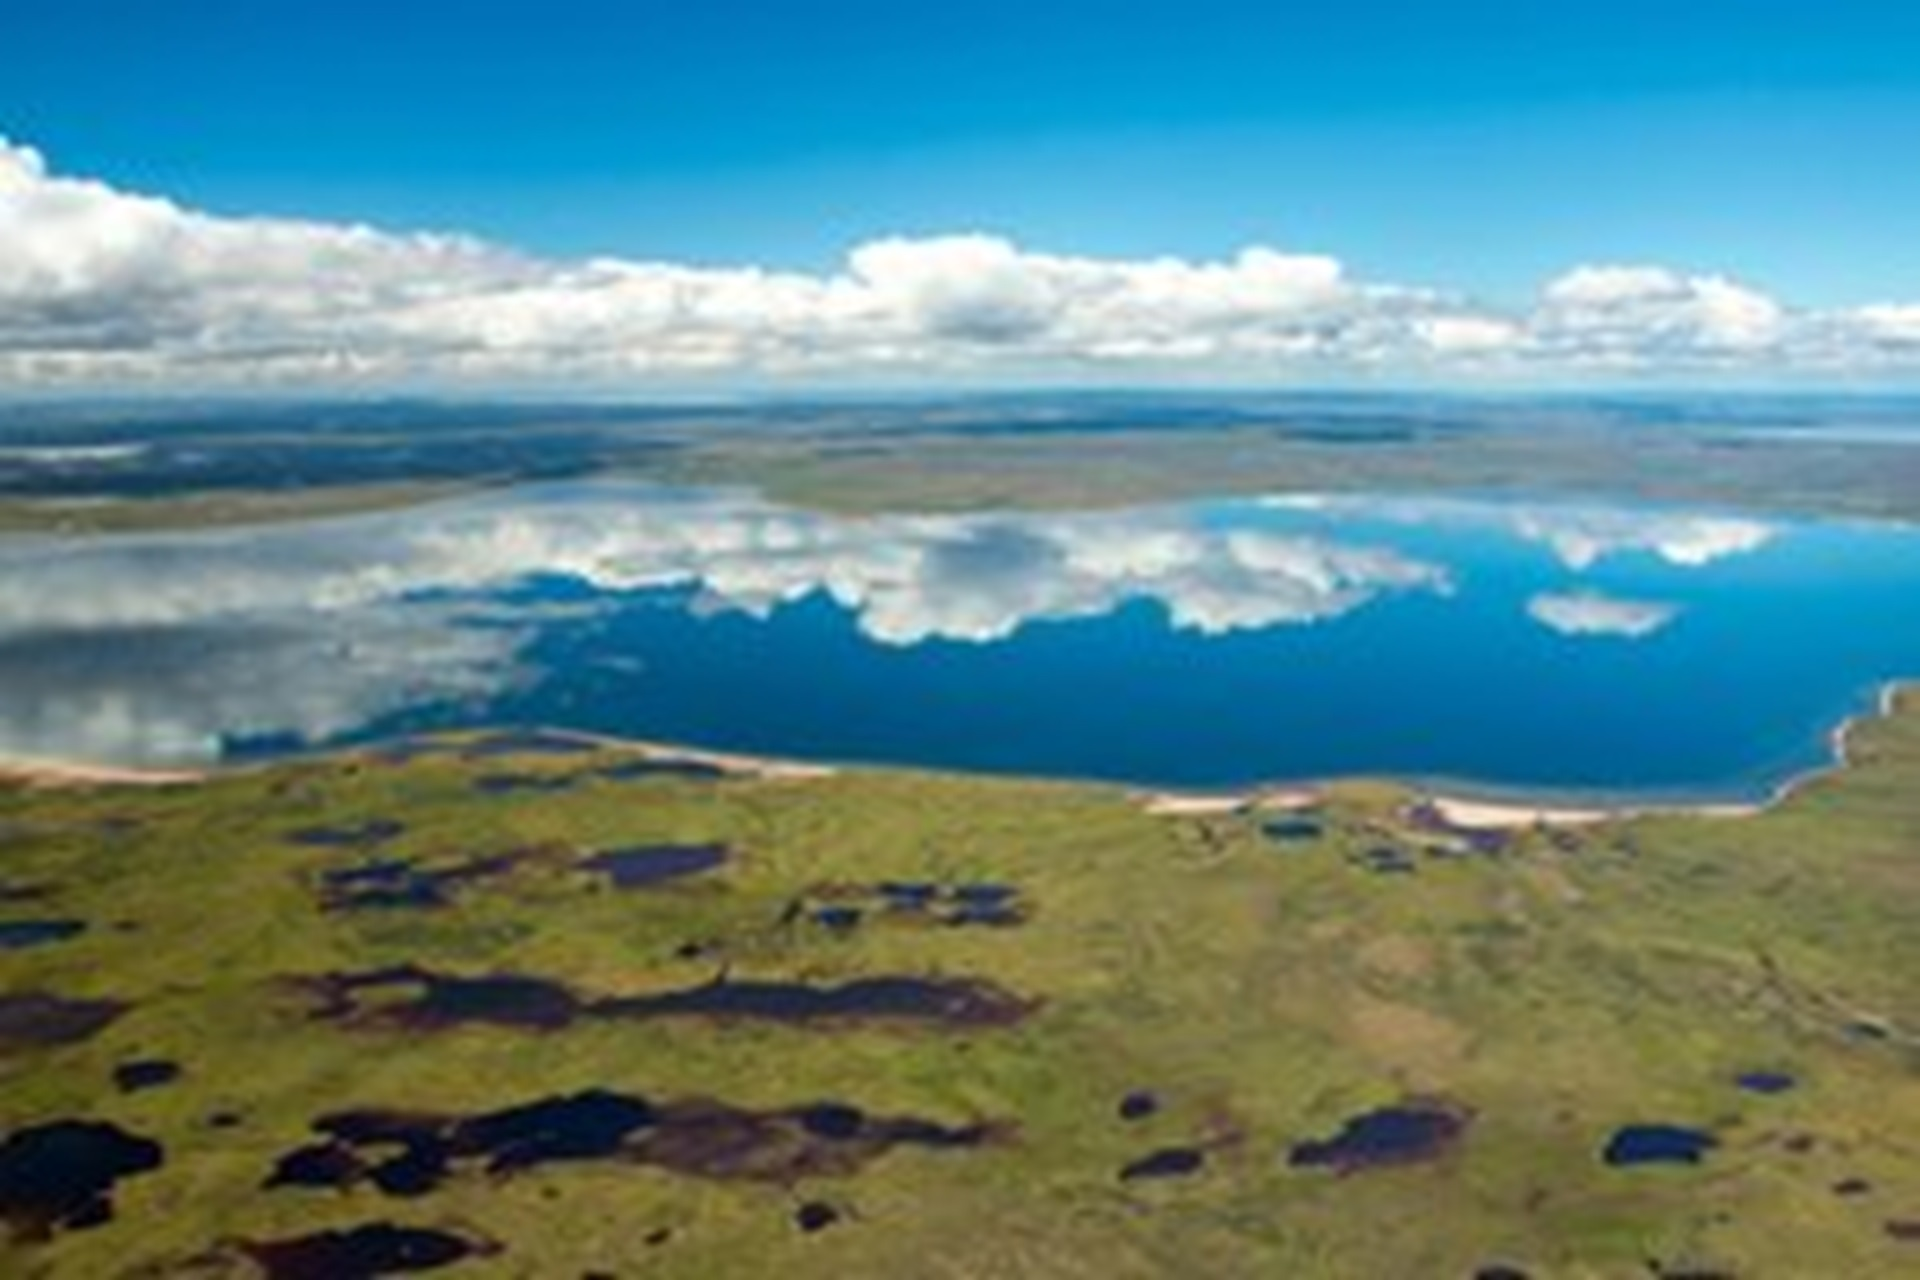 Photographie de la Région de Kiggavik, Nunavut, Canada.